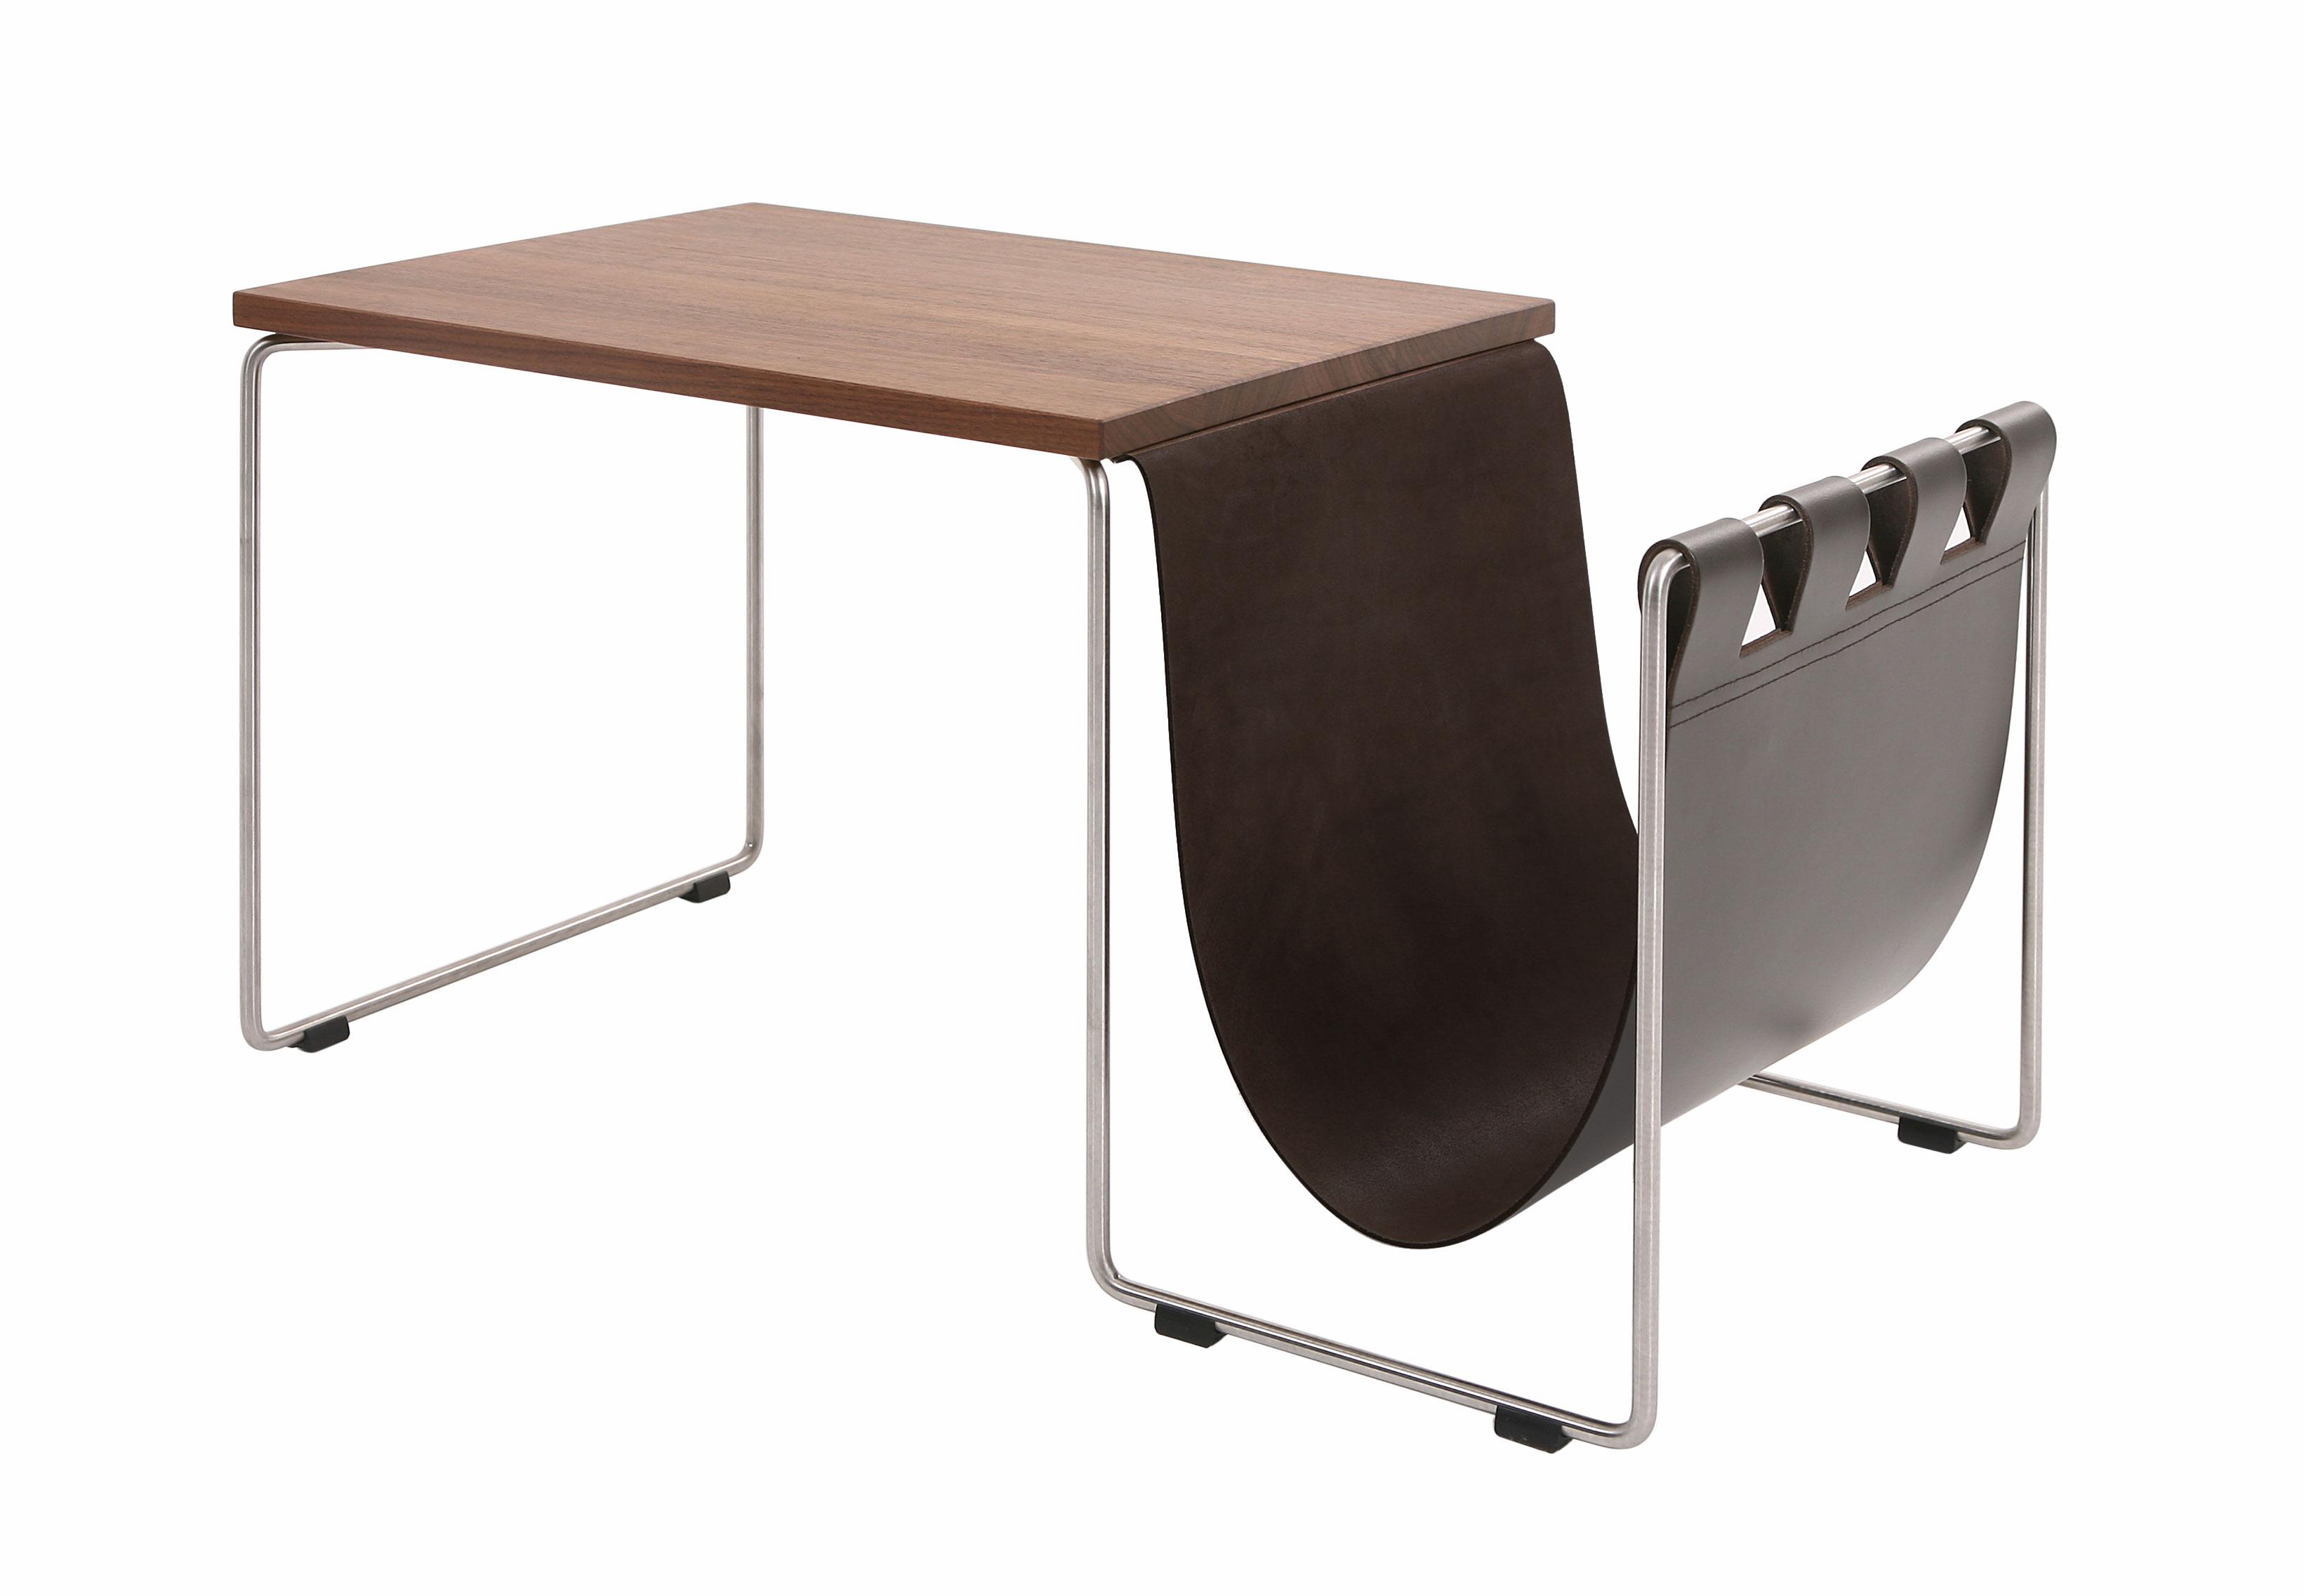 Kff Lemgo kff furniture exclusiv chair cantilever armchair